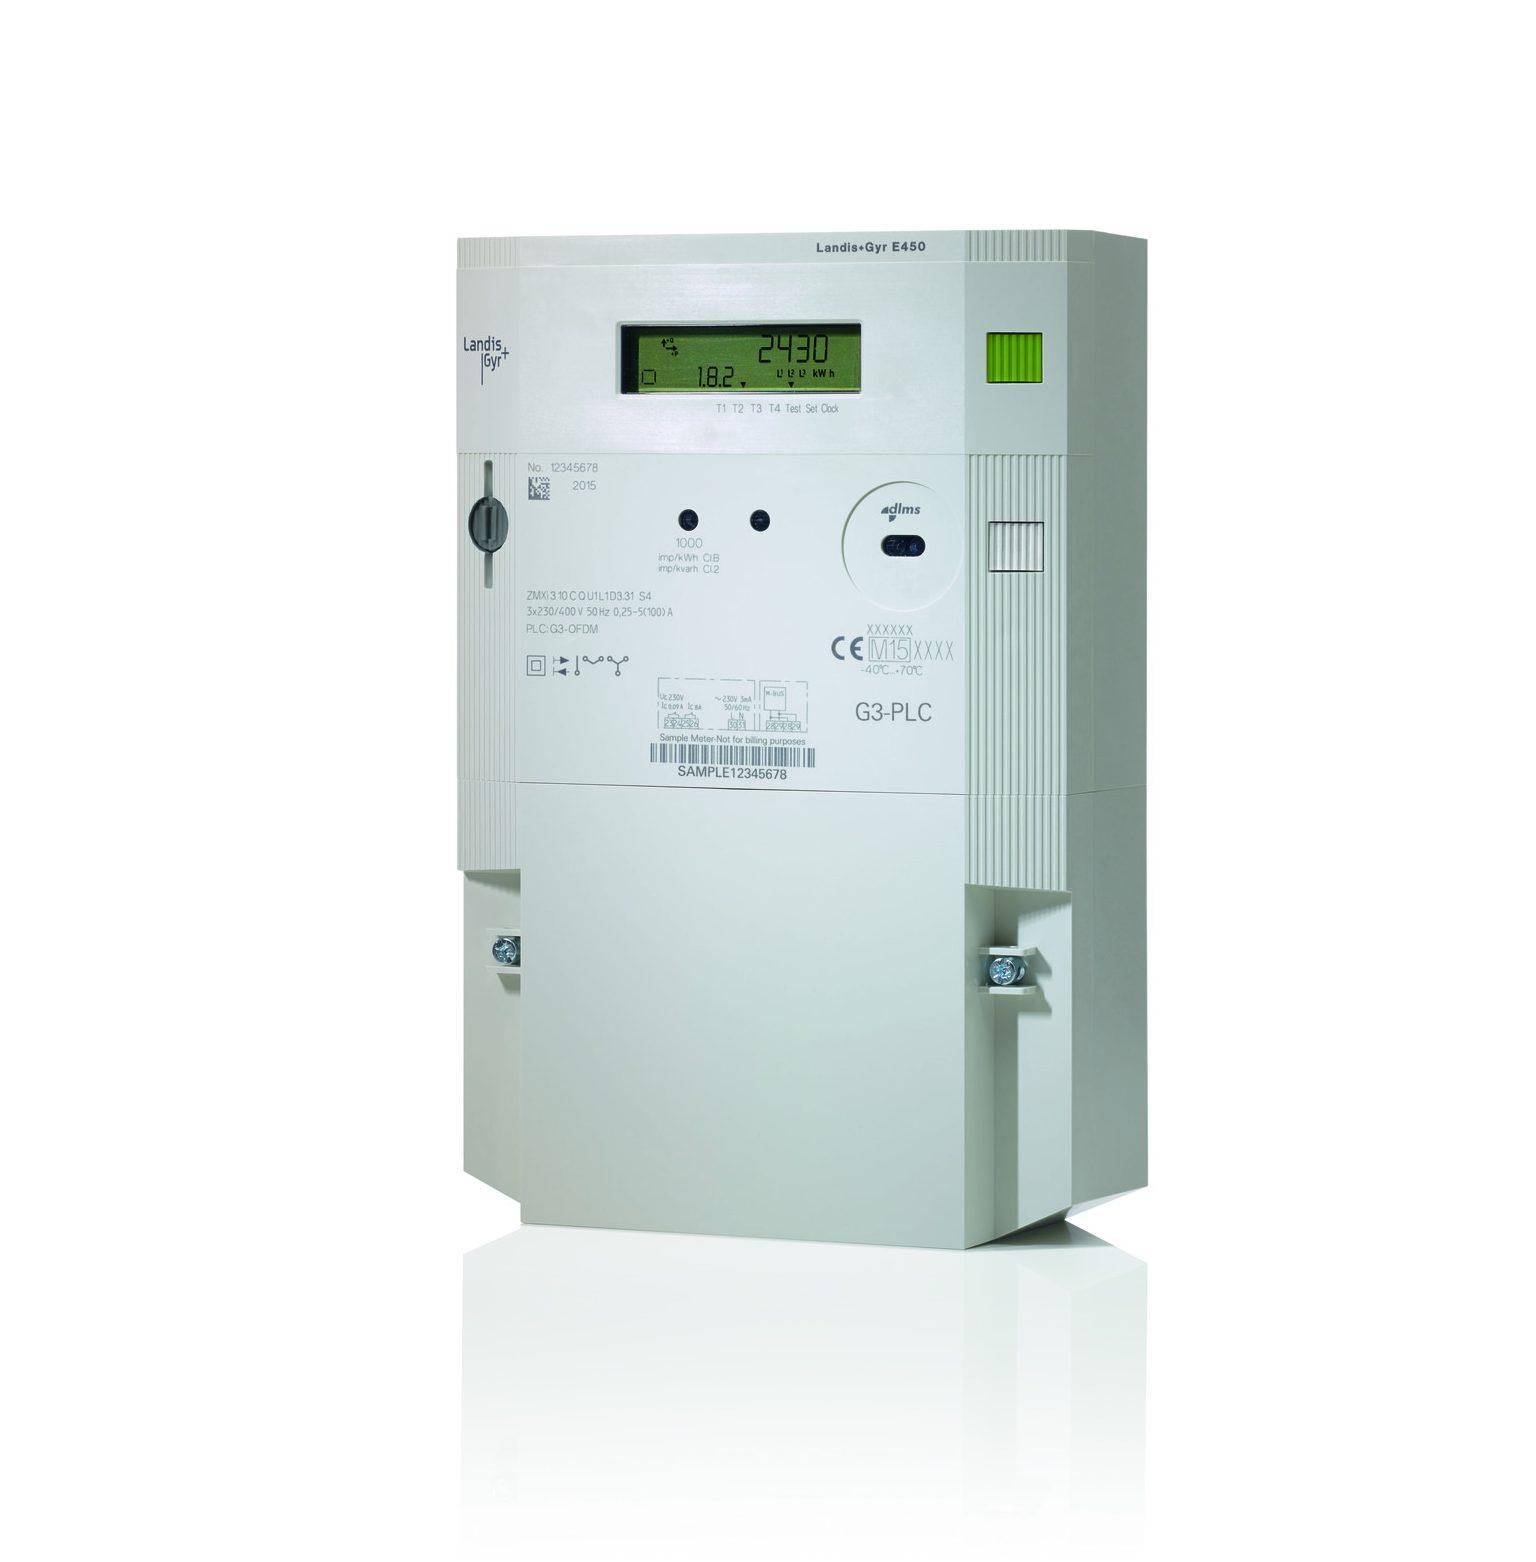 Residential Electricity Monitors : Landis gyr e